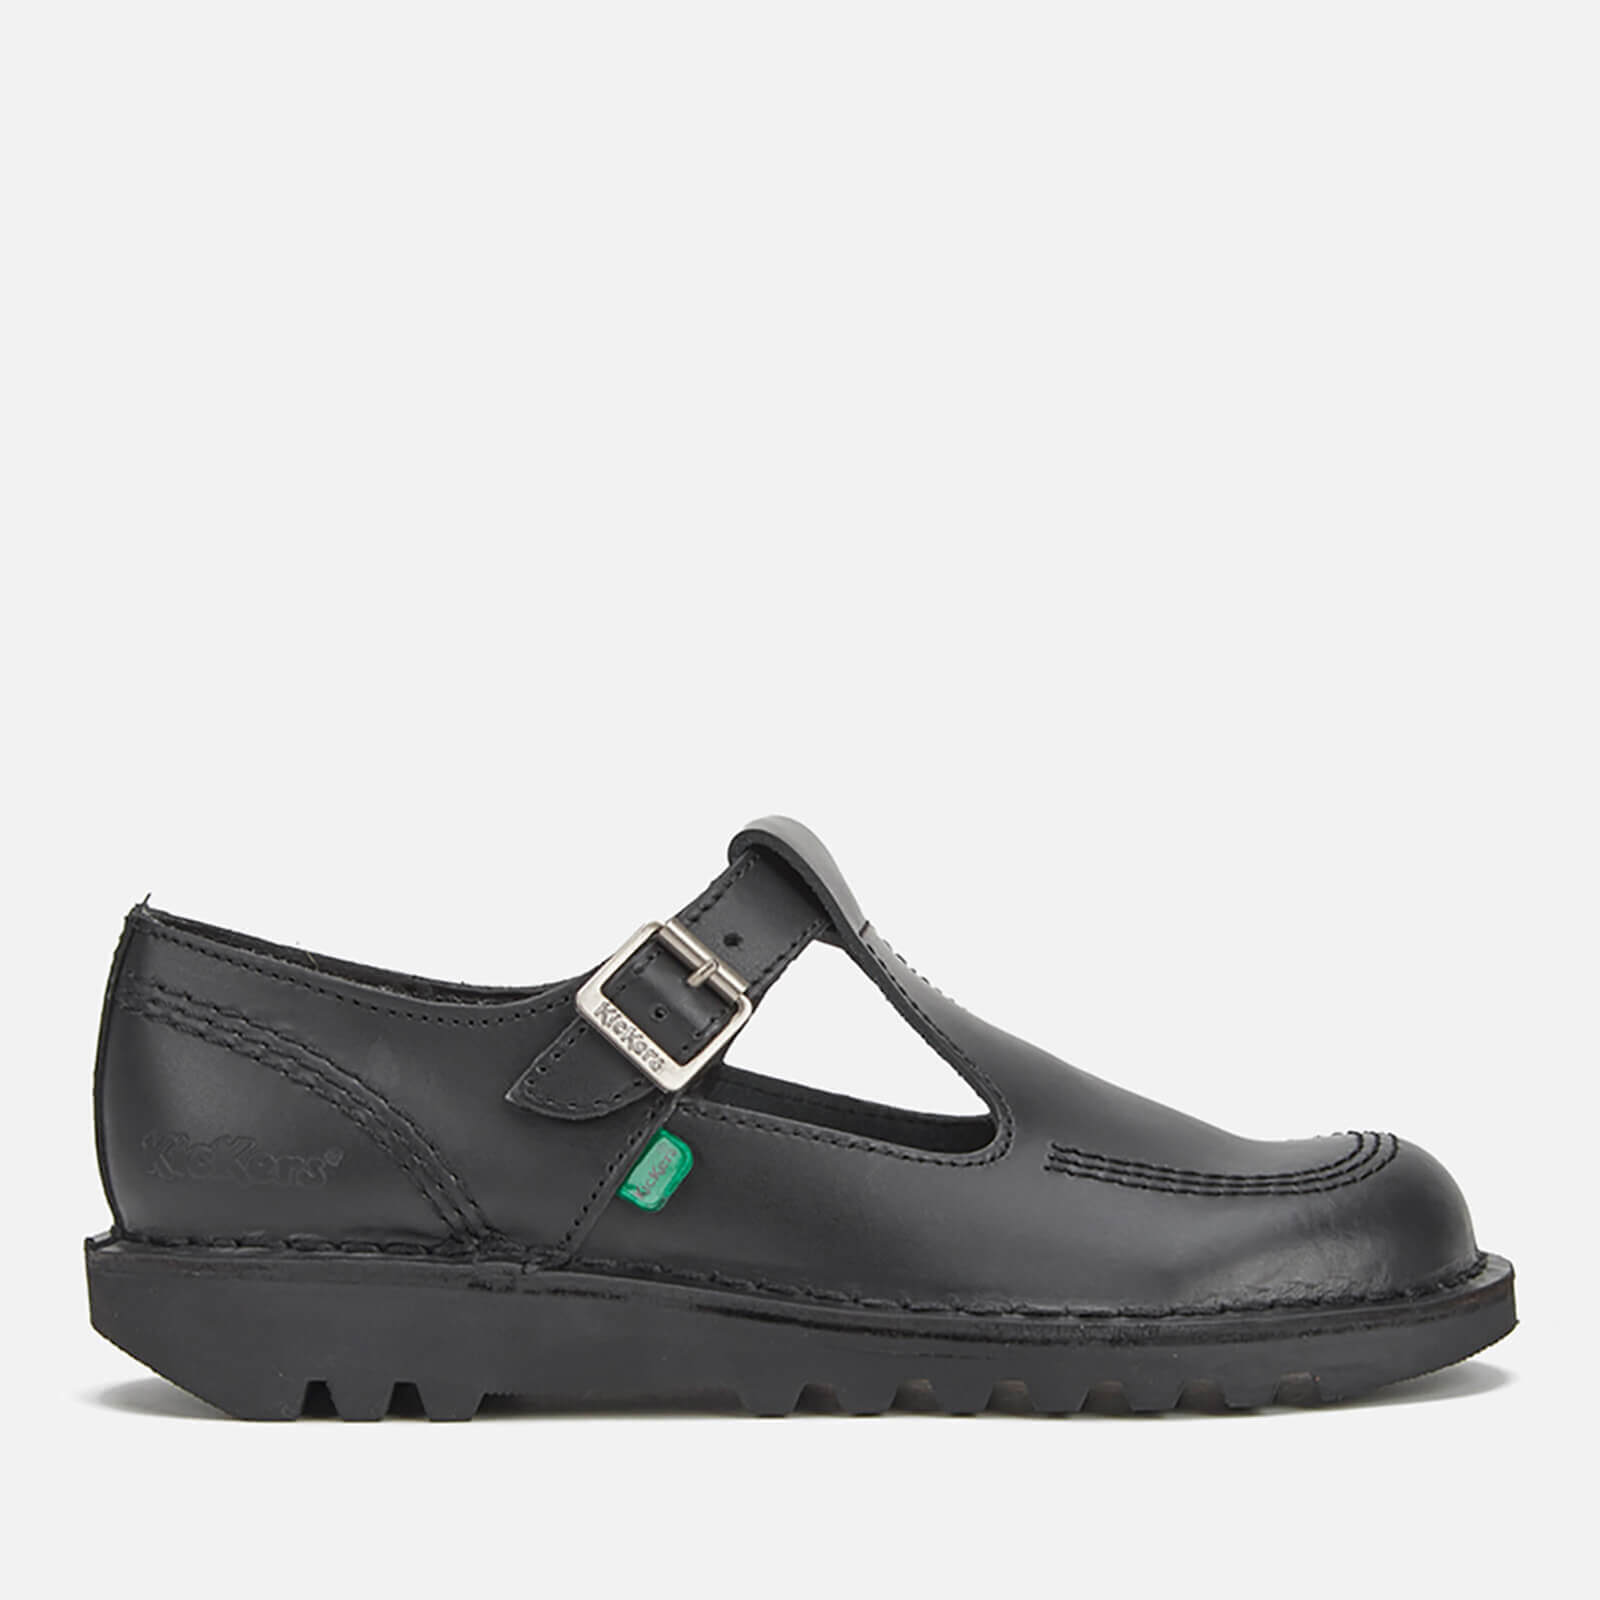 bce8c011a5052b Chaussures Kickers Femme Kick Lo Aztec T-Bar -Noir Womens Footwear ...